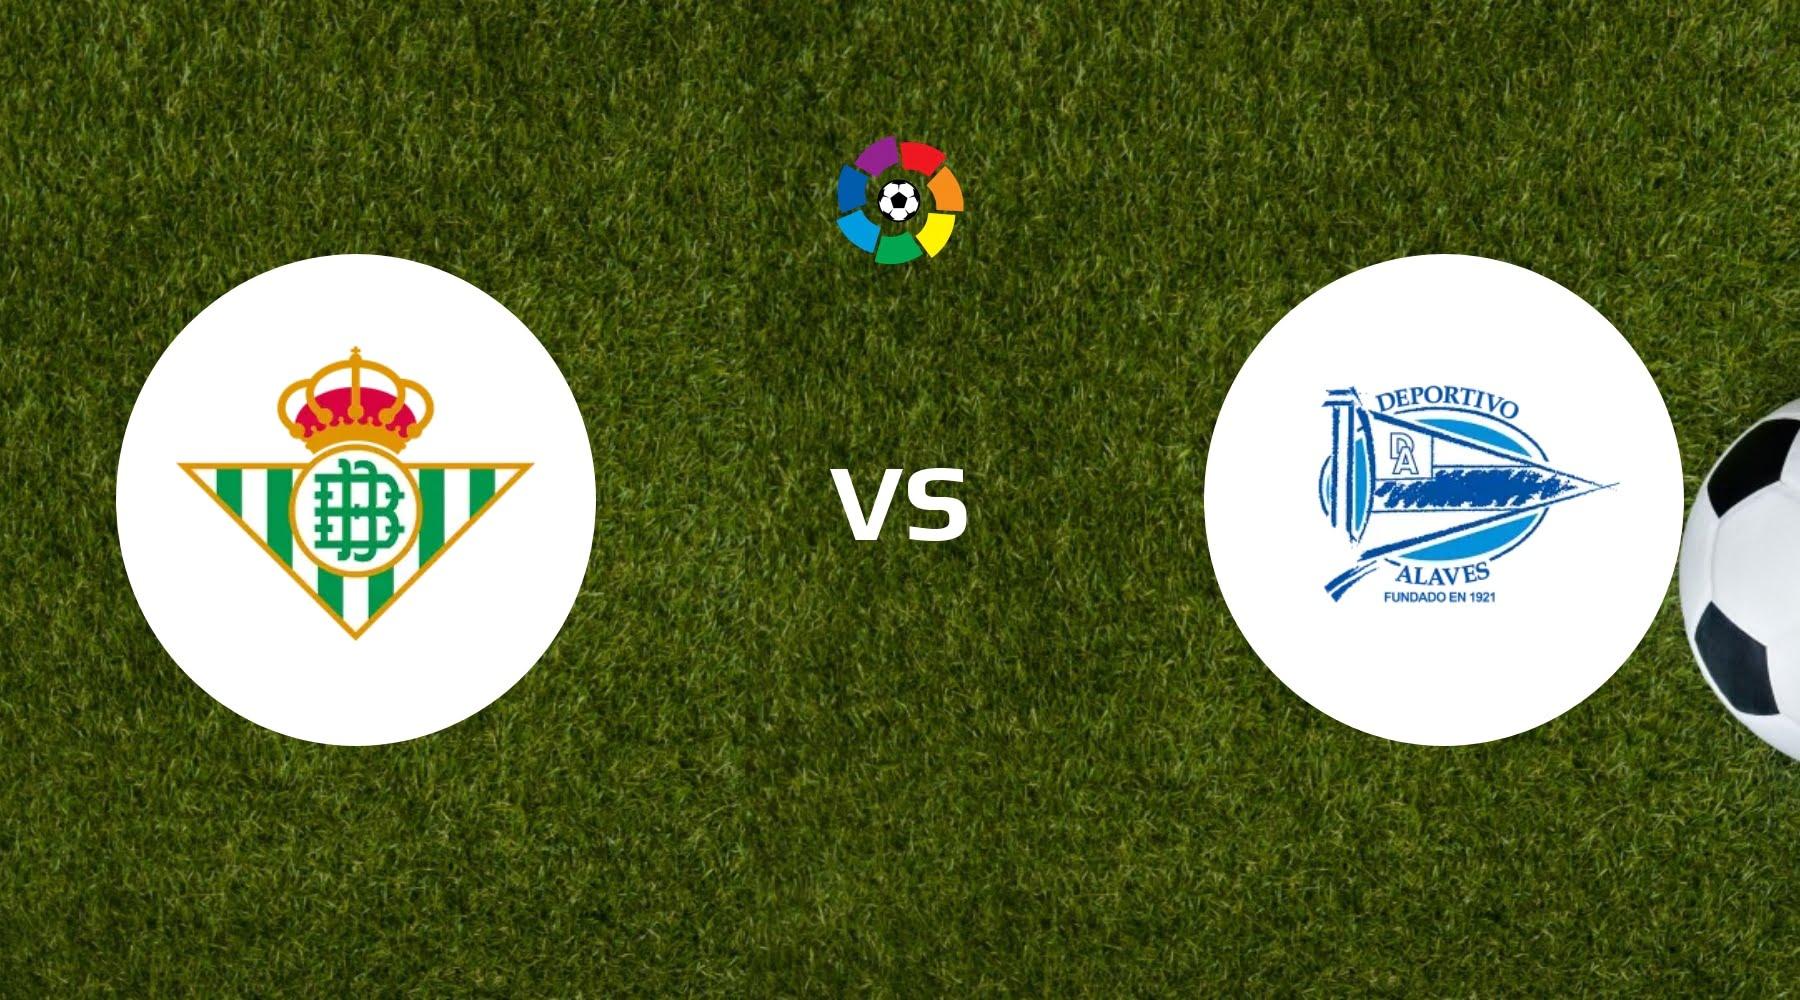 Real Betis vs Deportivo Alaves Betting